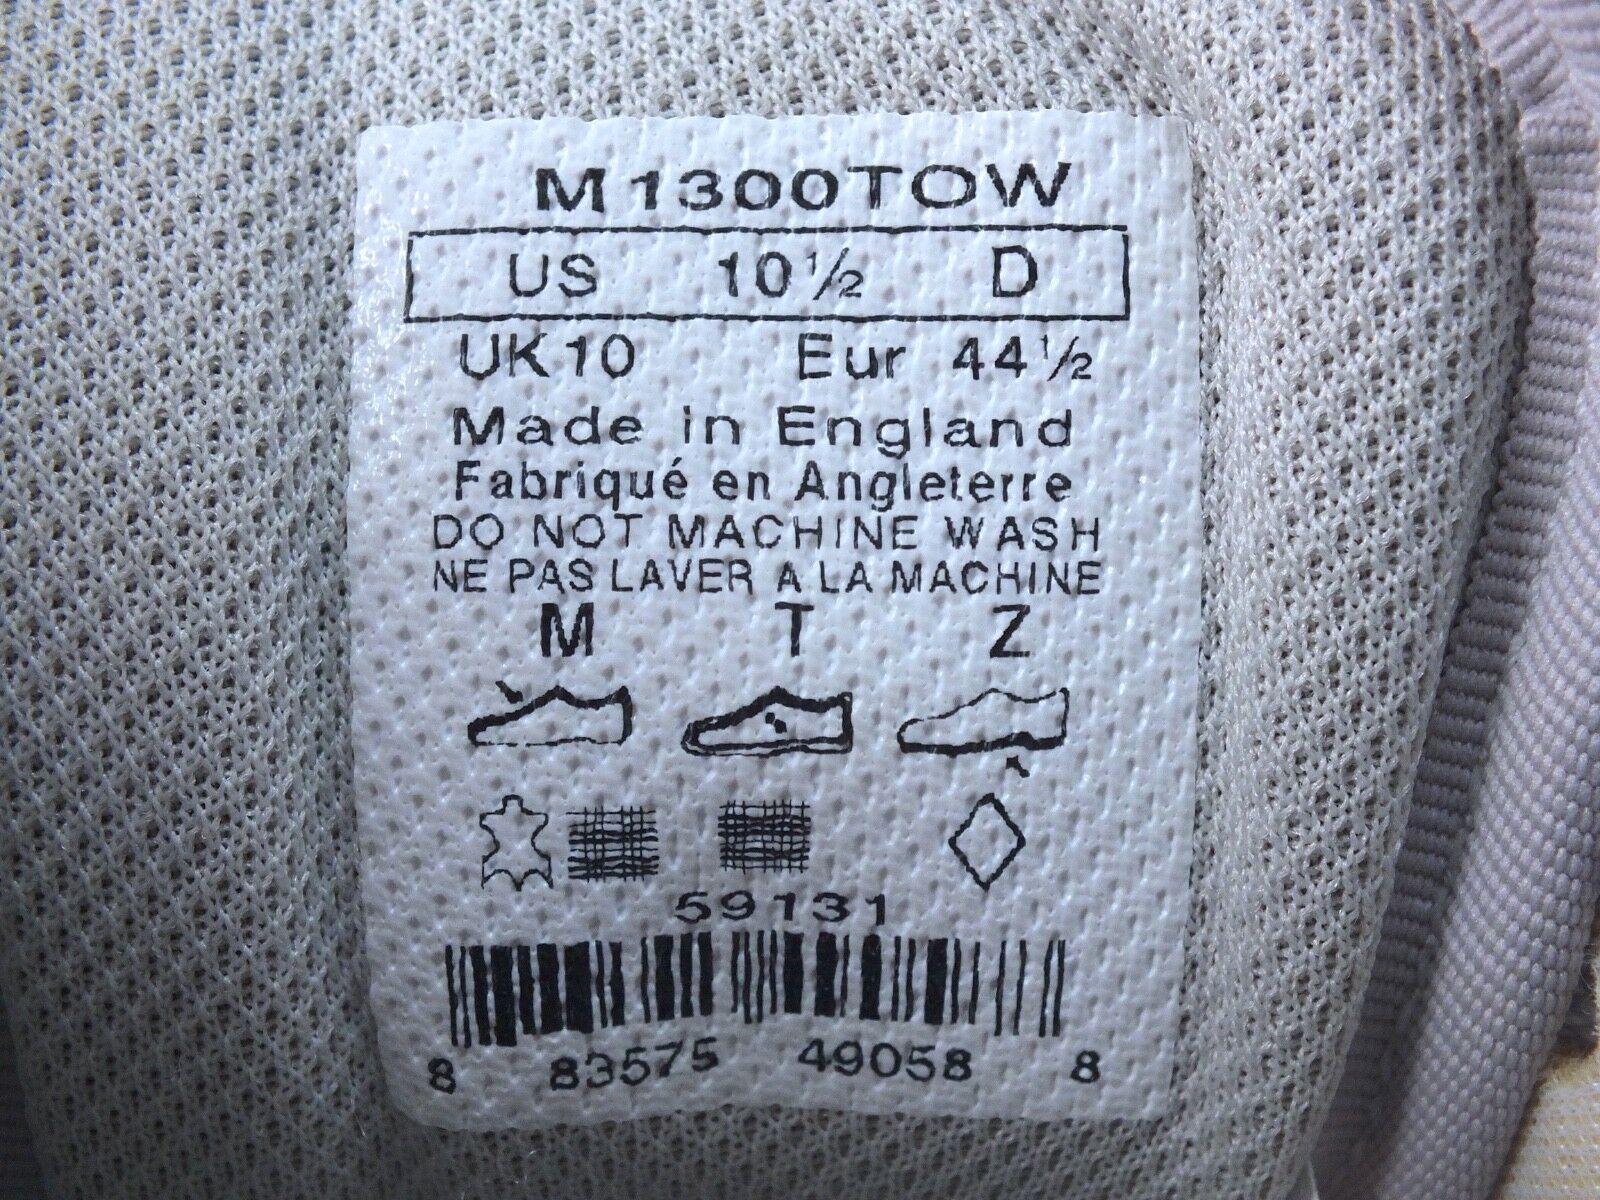 2008 New Balance 1300 Blue/Grigio/Orange England Made in England Blue/Grigio/Orange Sz 10.5D US 7a388c